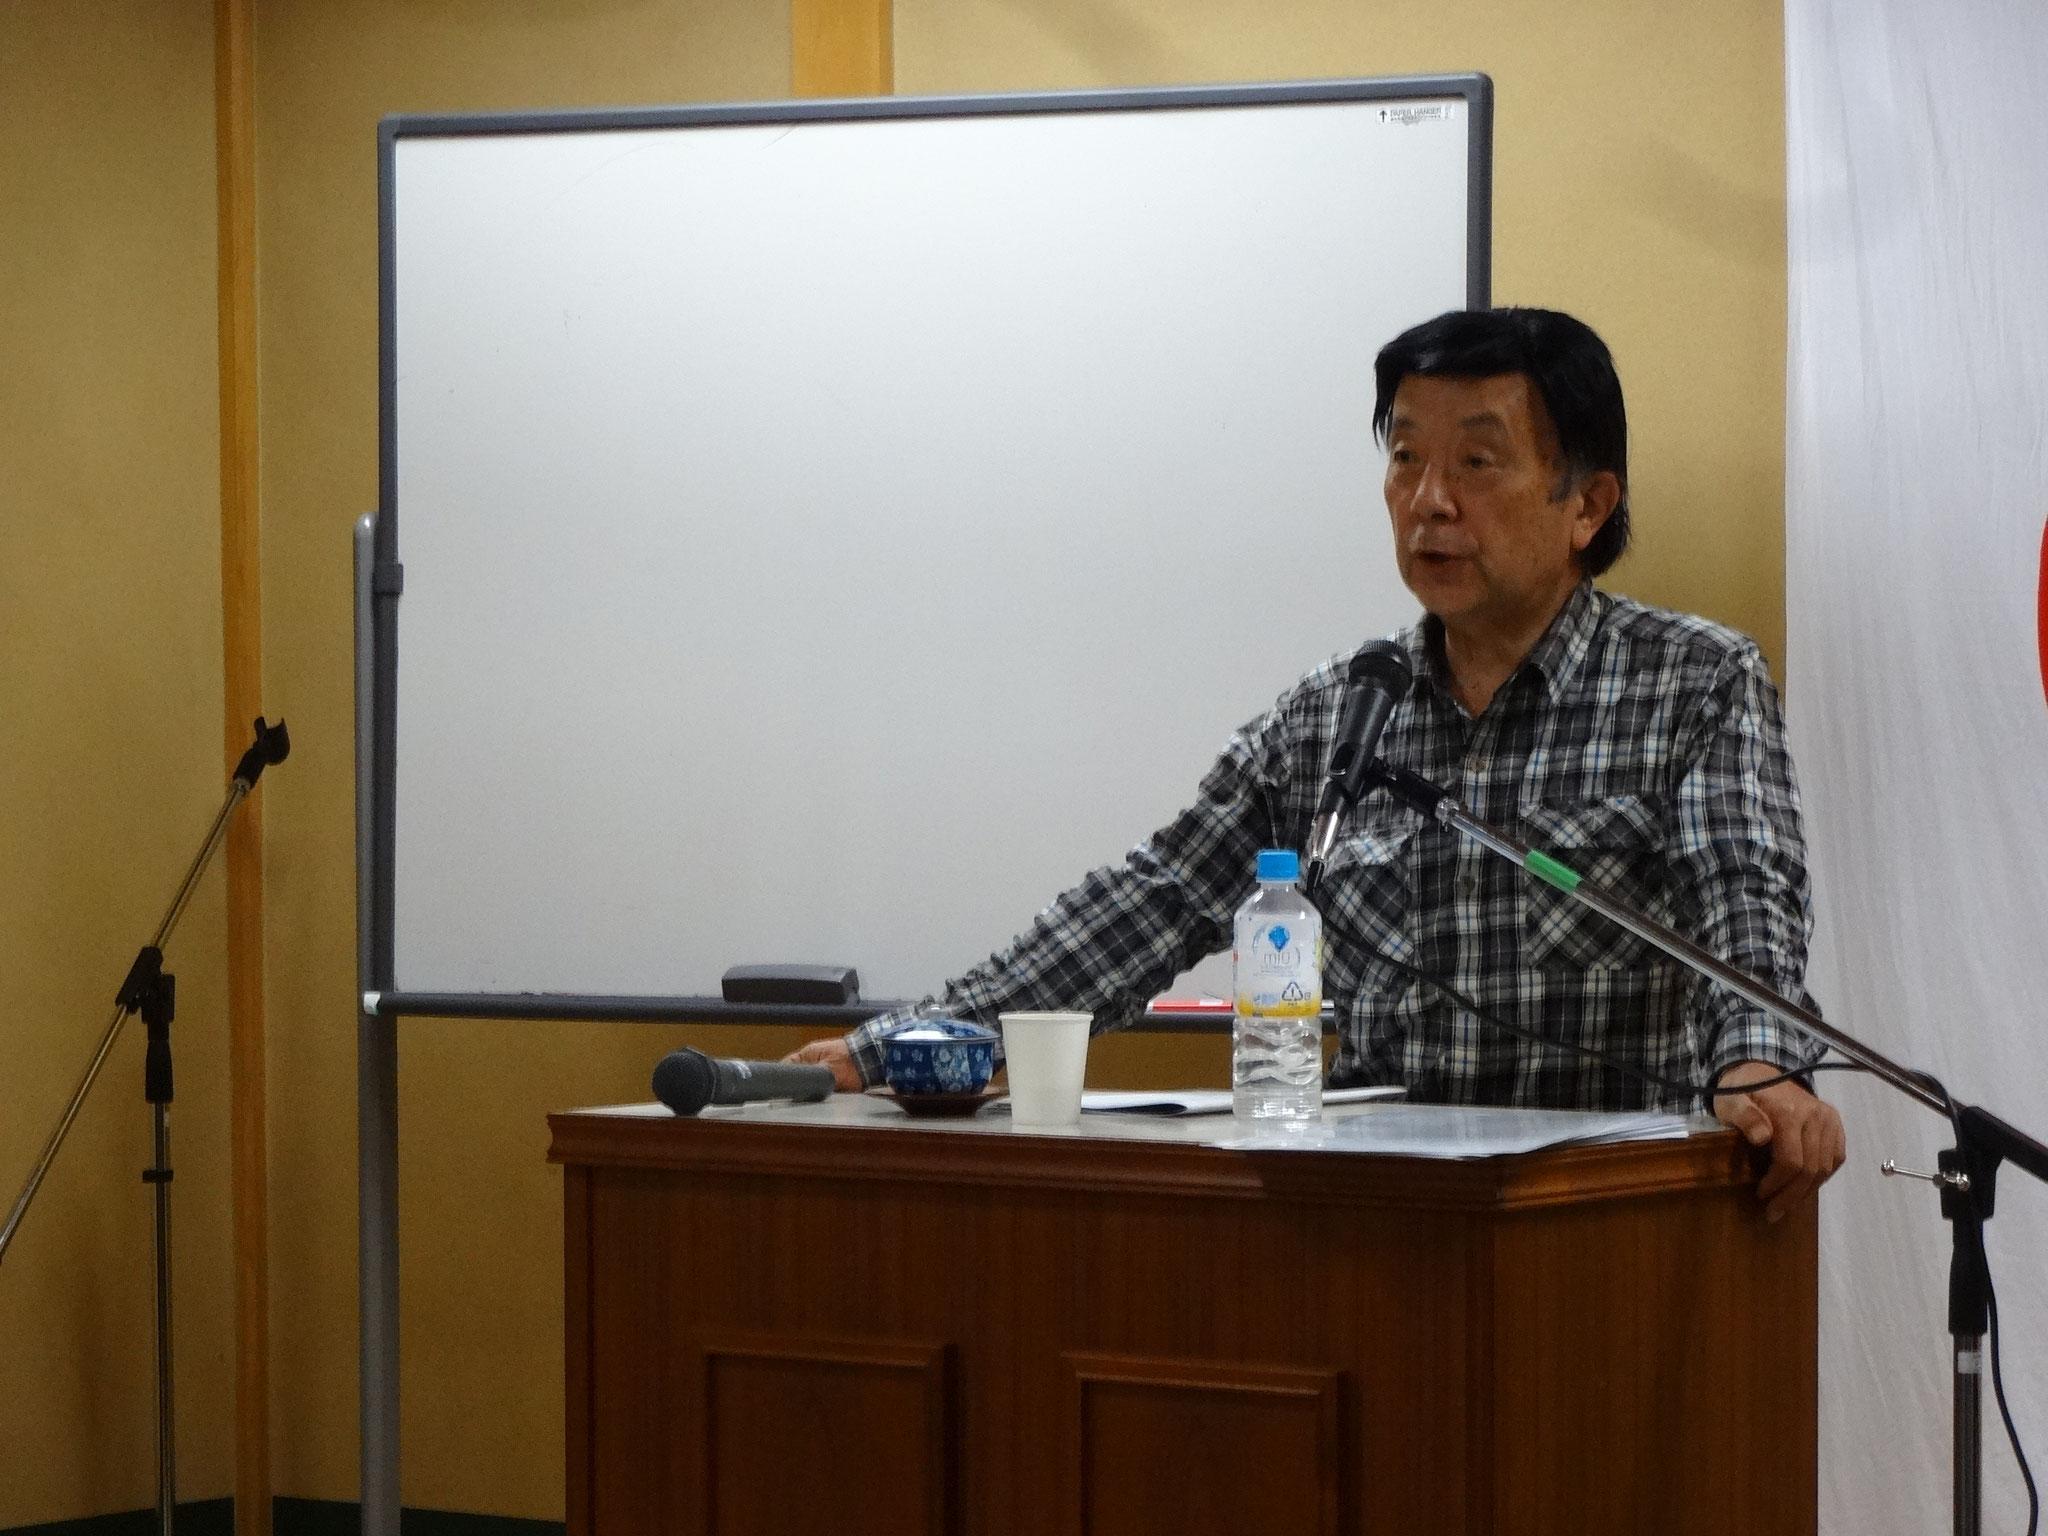 皇學館大學・岡田登教授のミニ講演会